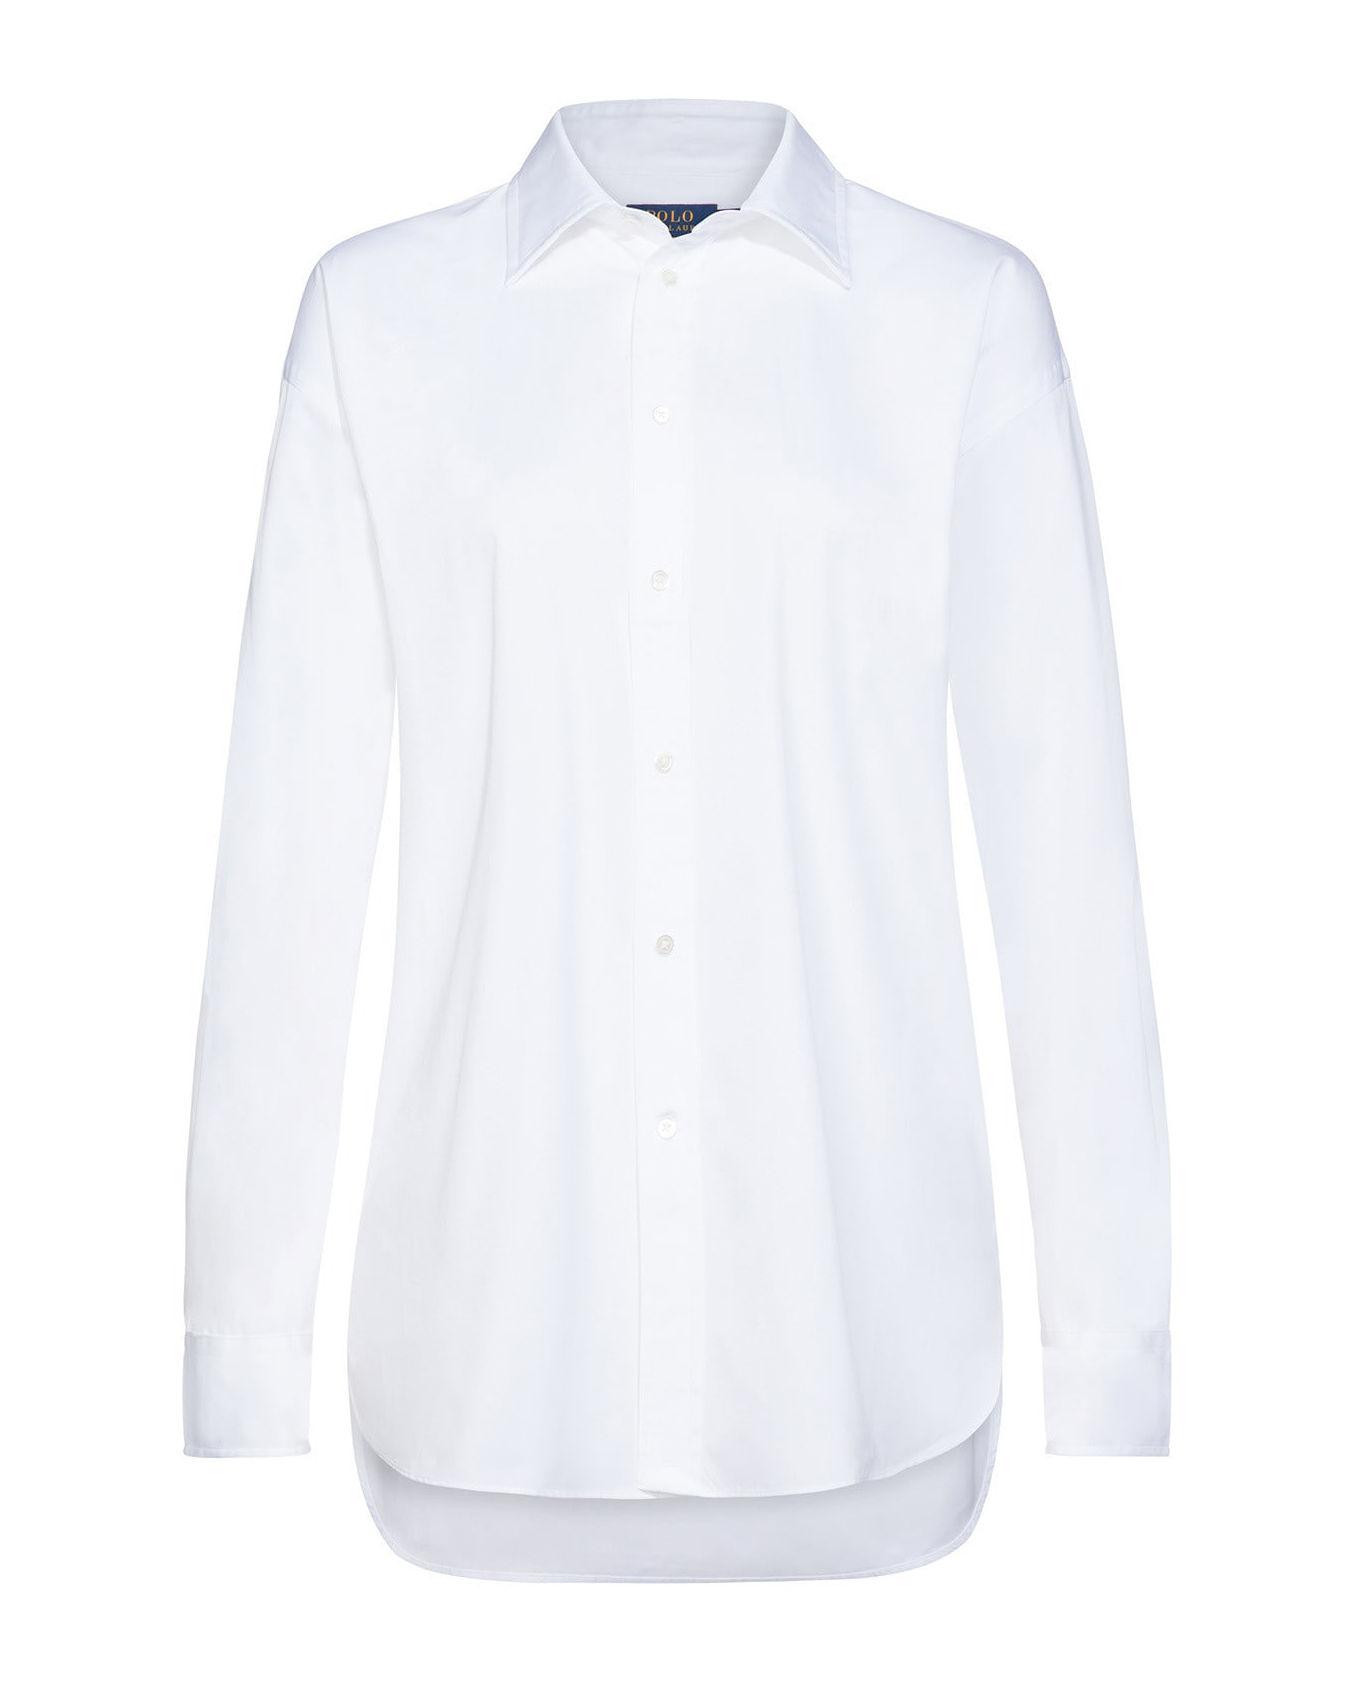 49daa20882ea4b Biała koszula relaxed fit RALPH LAUREN – Kup Teraz! Najlepsze ceny i ...